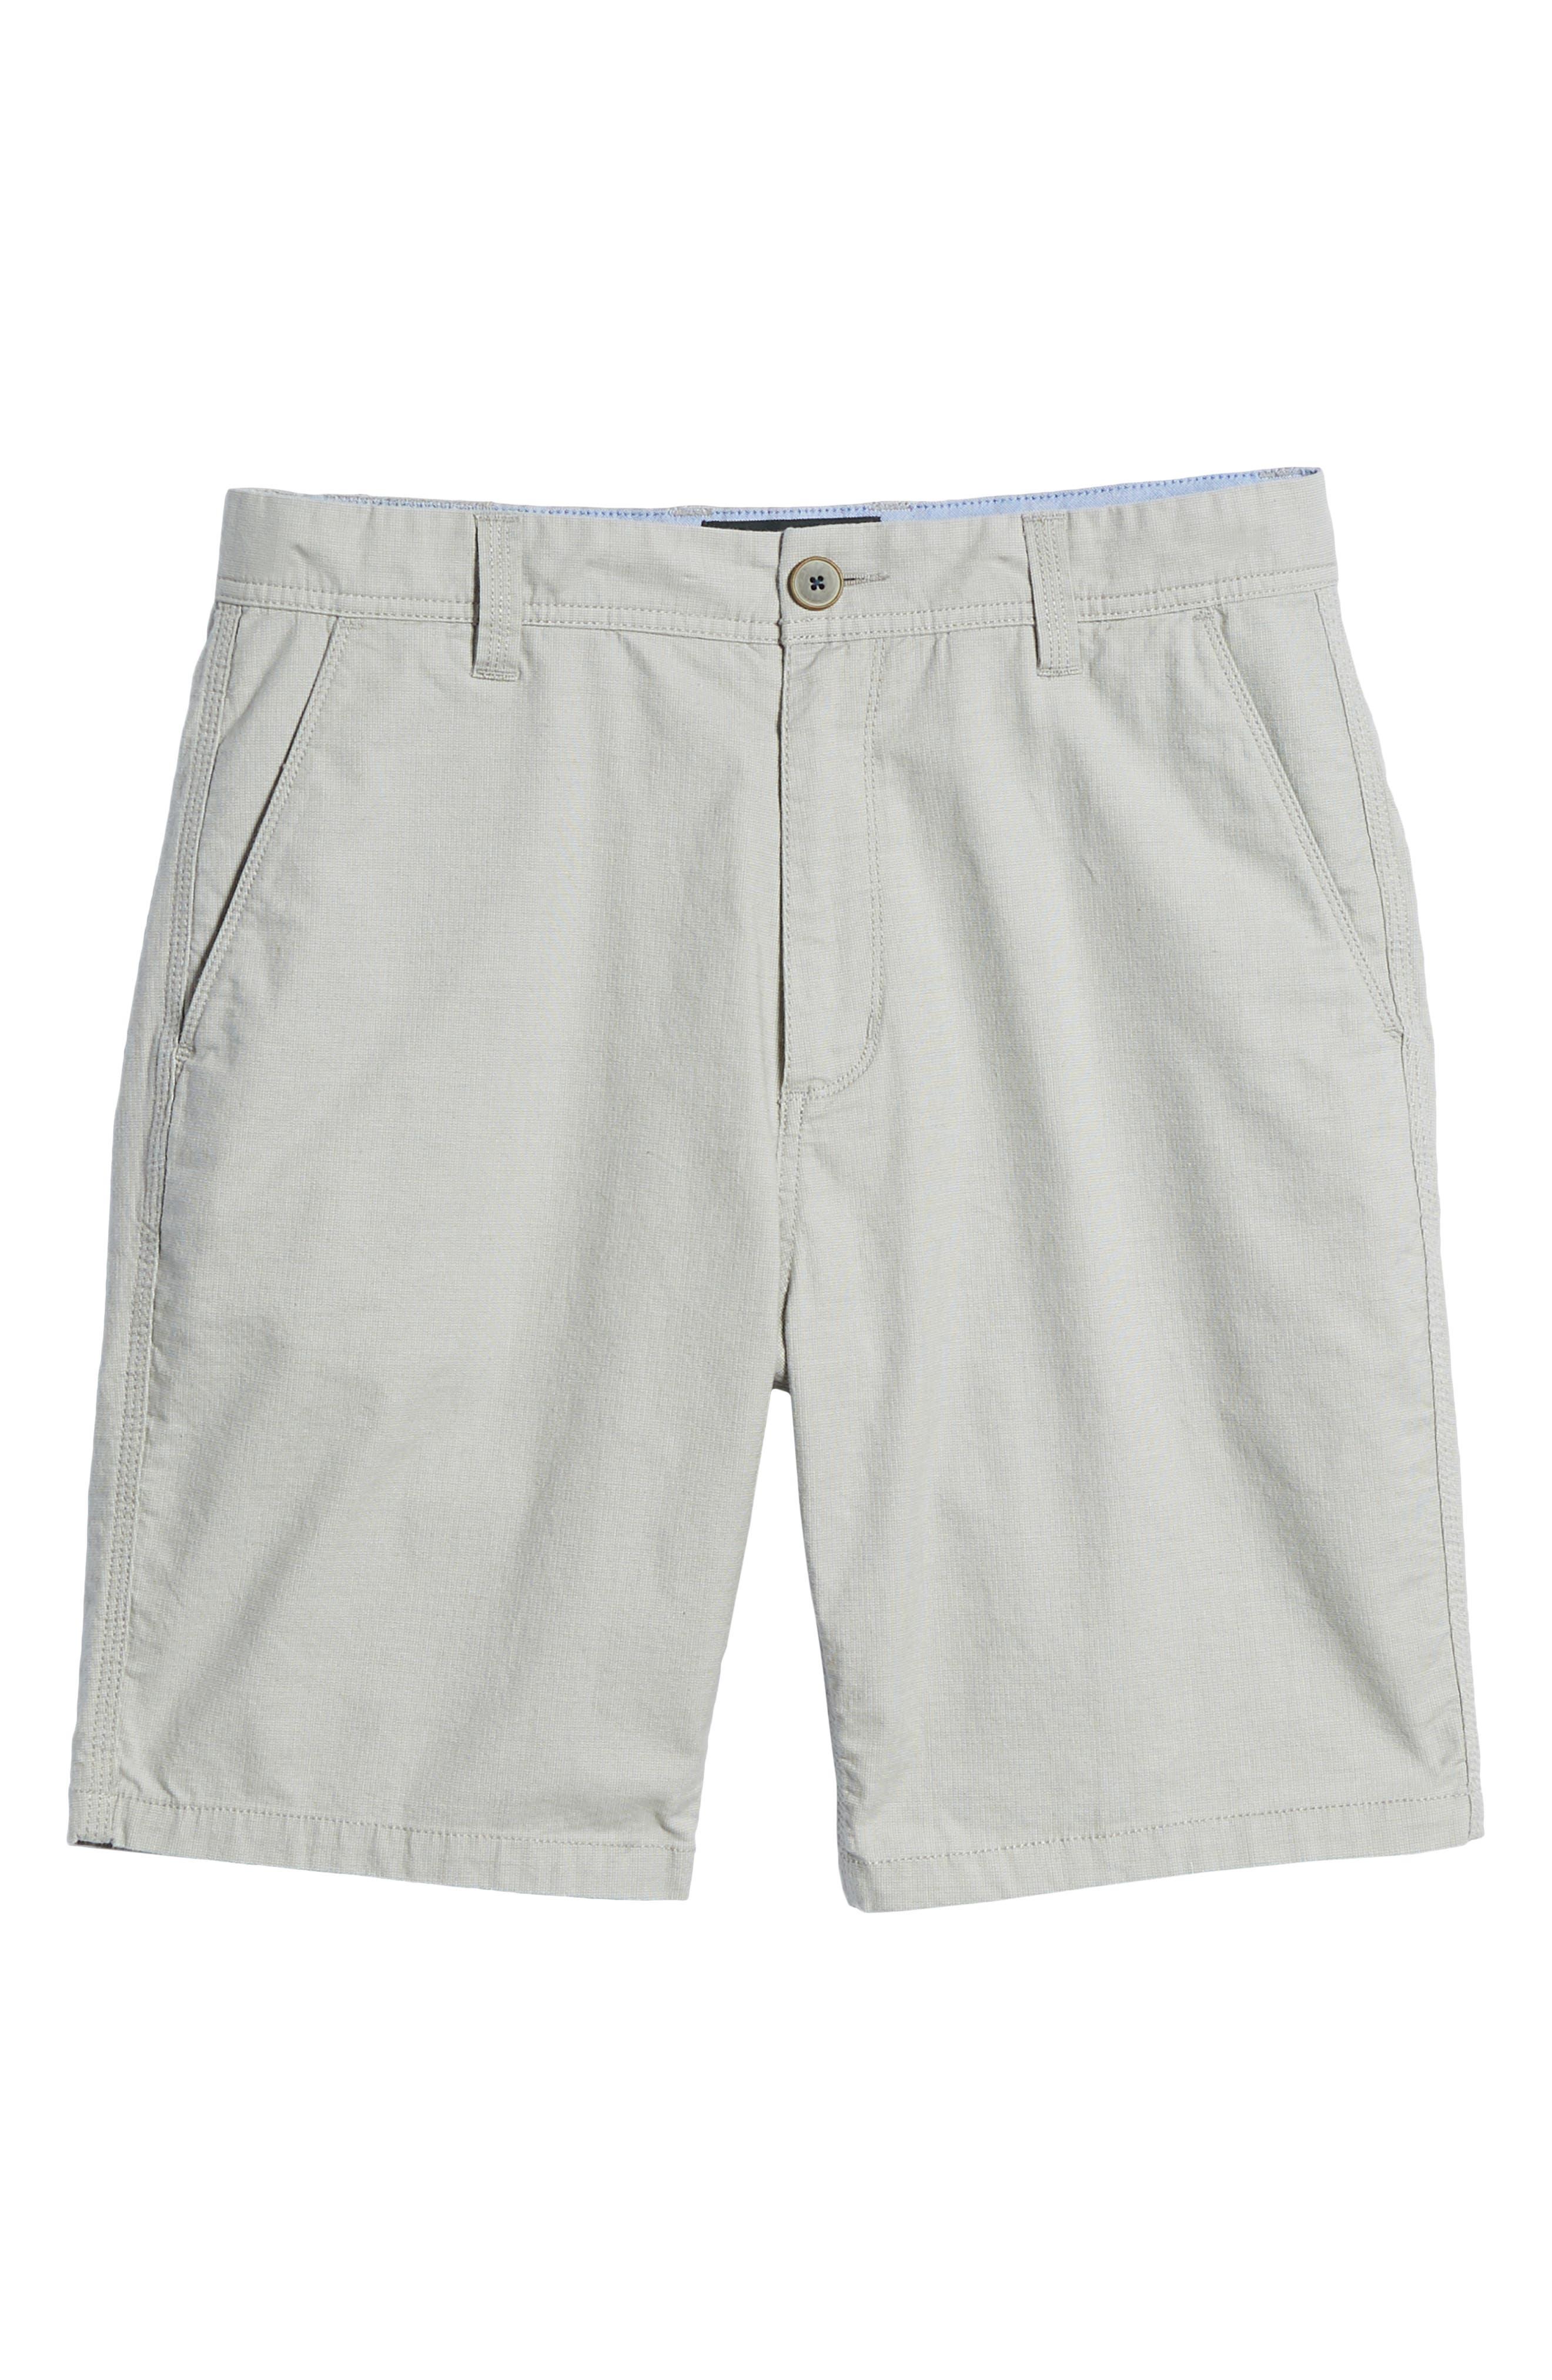 Millwater Shorts,                             Alternate thumbnail 6, color,                             Sand